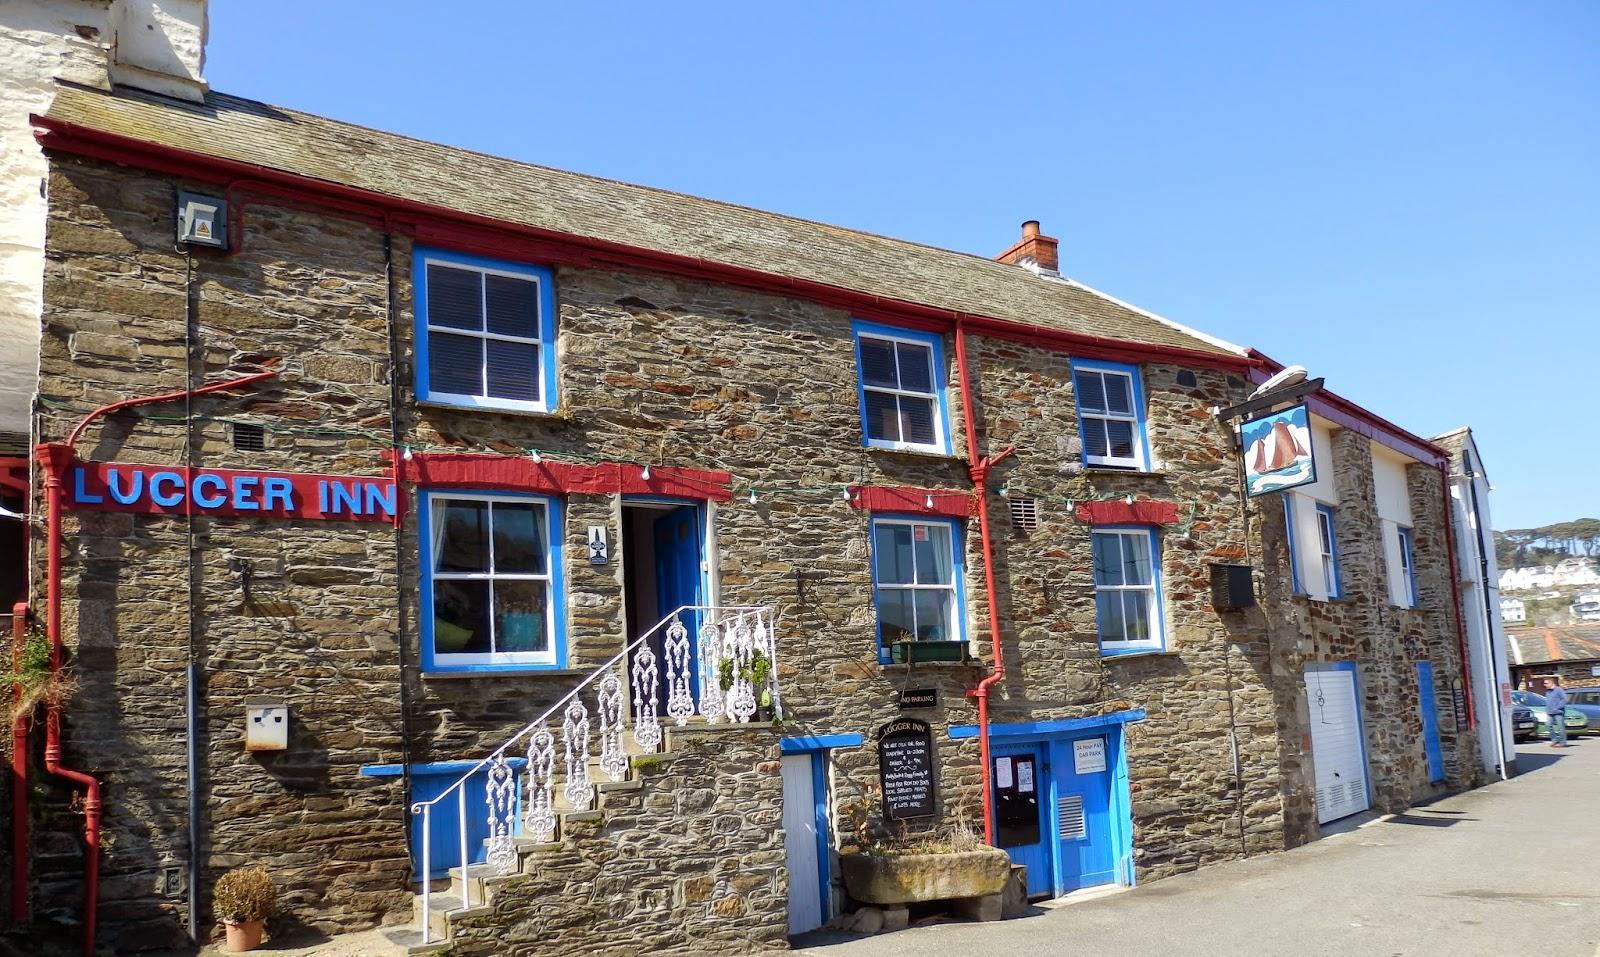 Lugger pub Polruan Cornwall